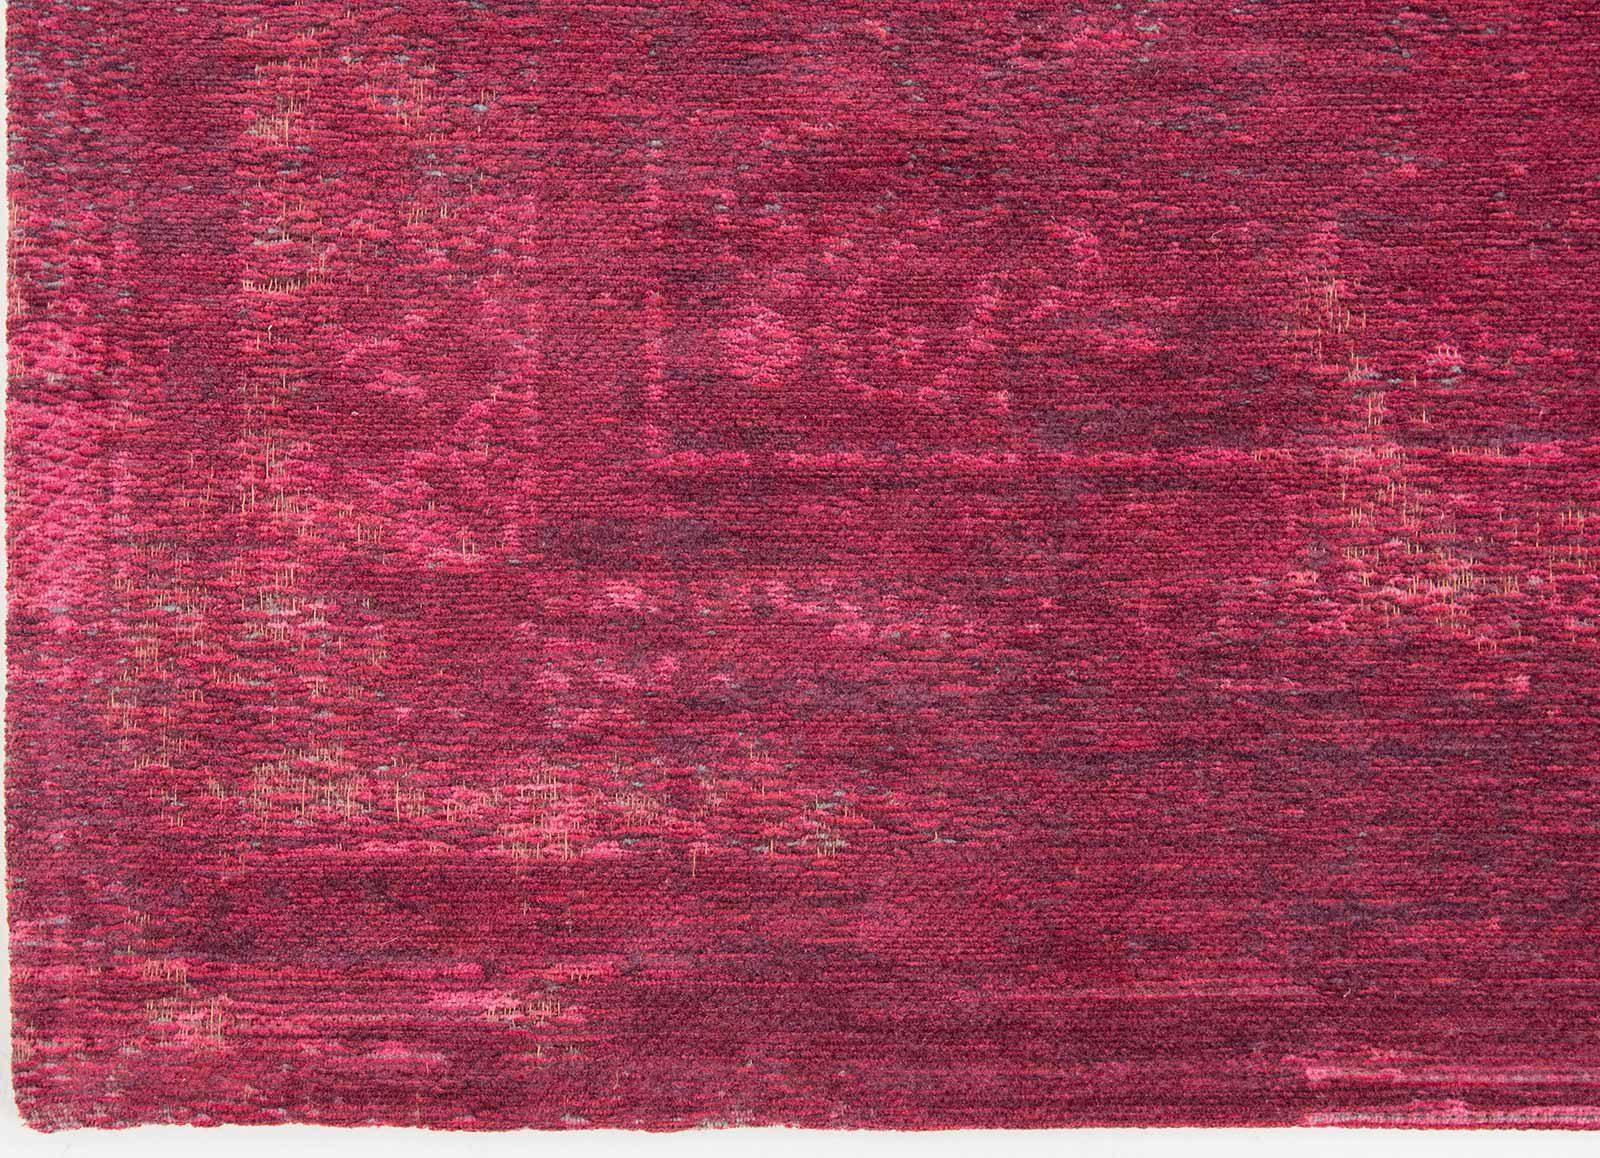 vloerkleed Louis De Poortere LX8260 Fading World Medaillon Scarlet corner